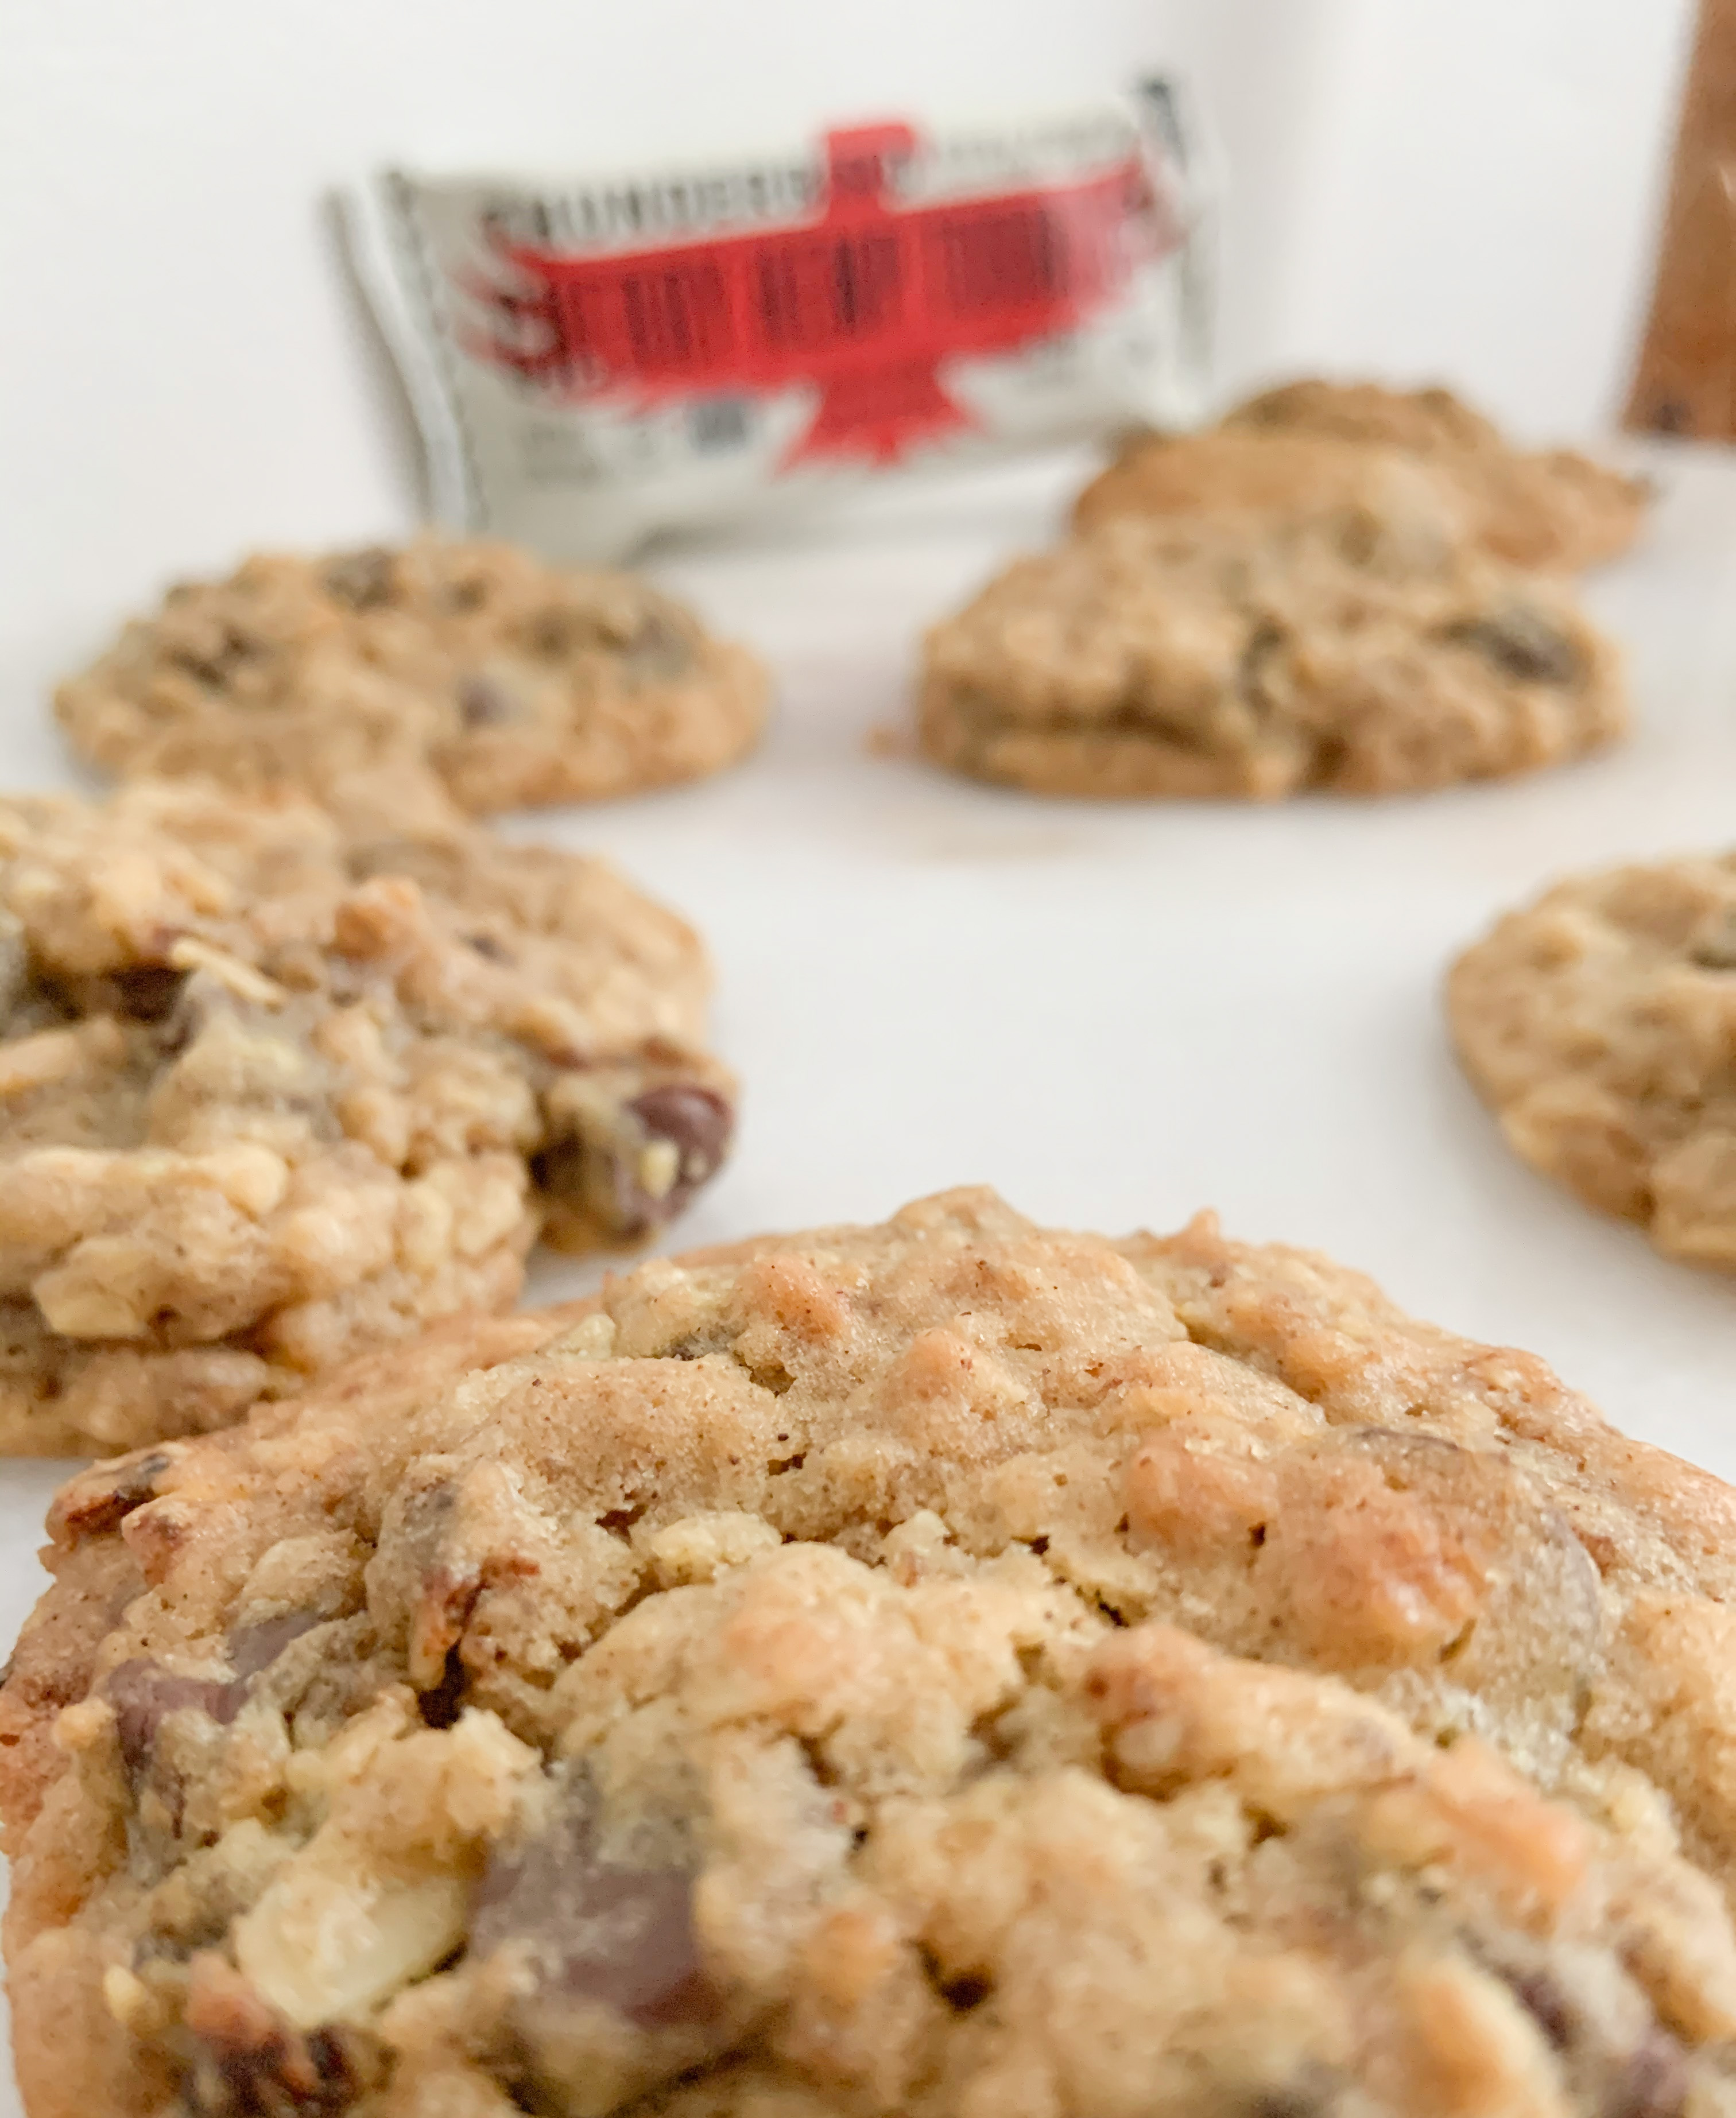 Gluten-Free Thunderbird (Cherry Hemp Turmeric) Bar & Chocolate Chip Oatmeal Cookies!